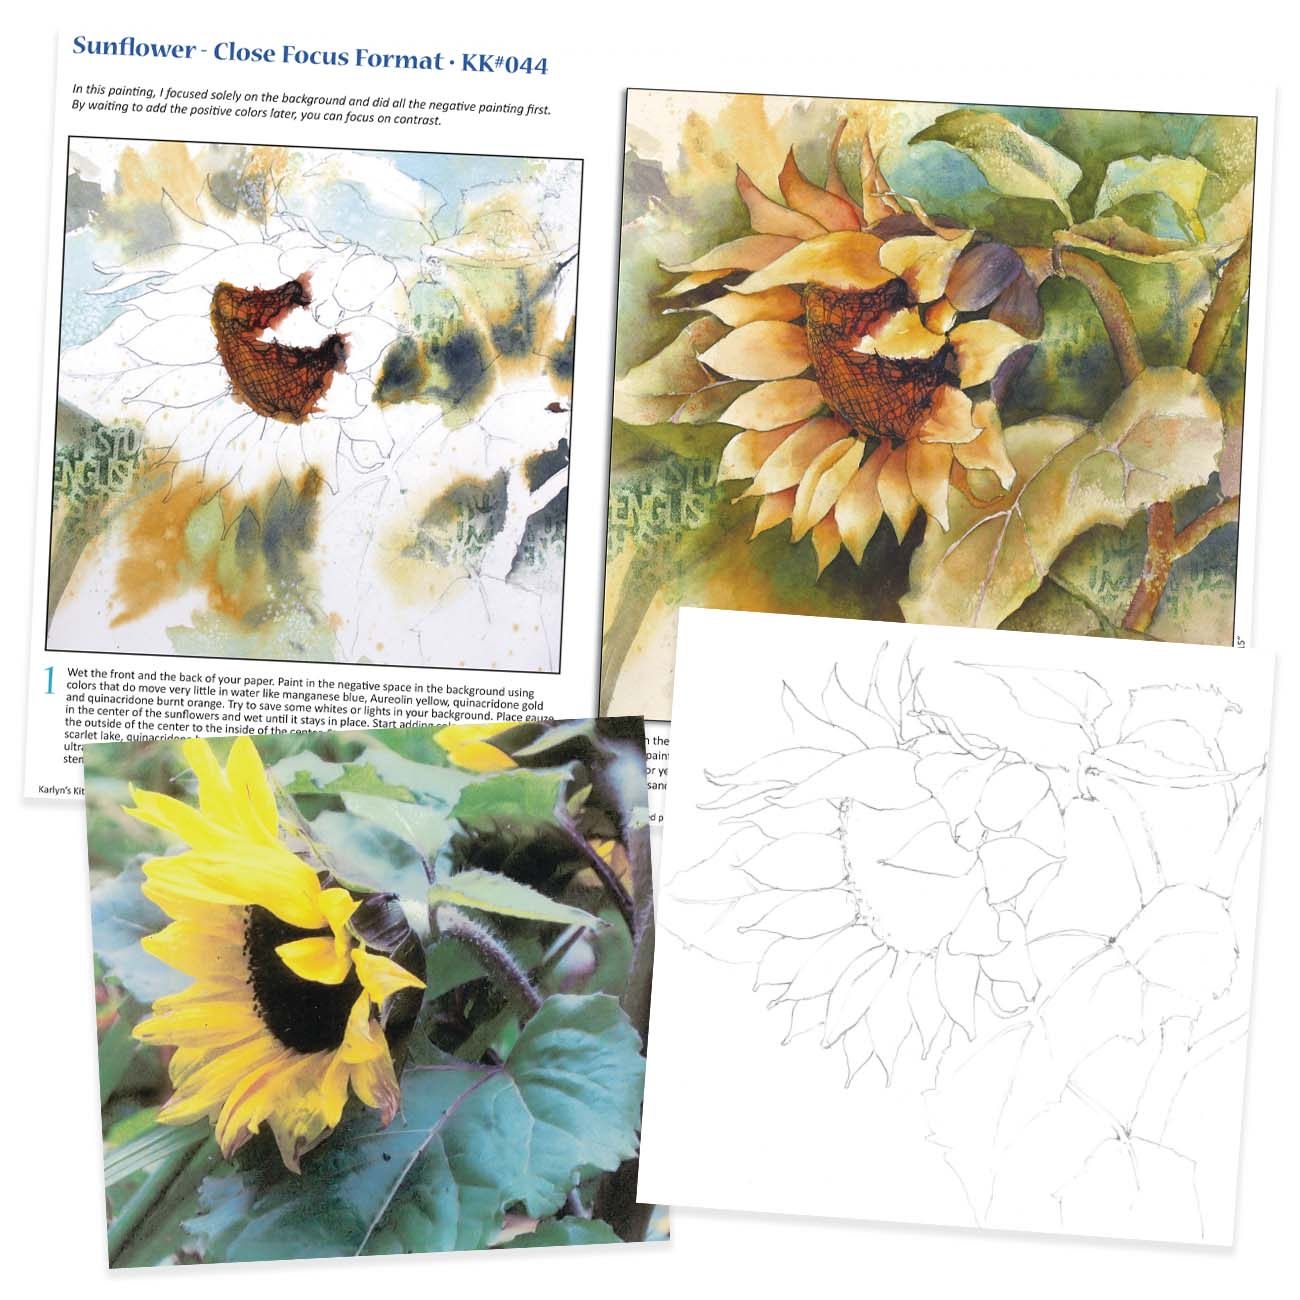 KK044 Sunflower - Close Focus